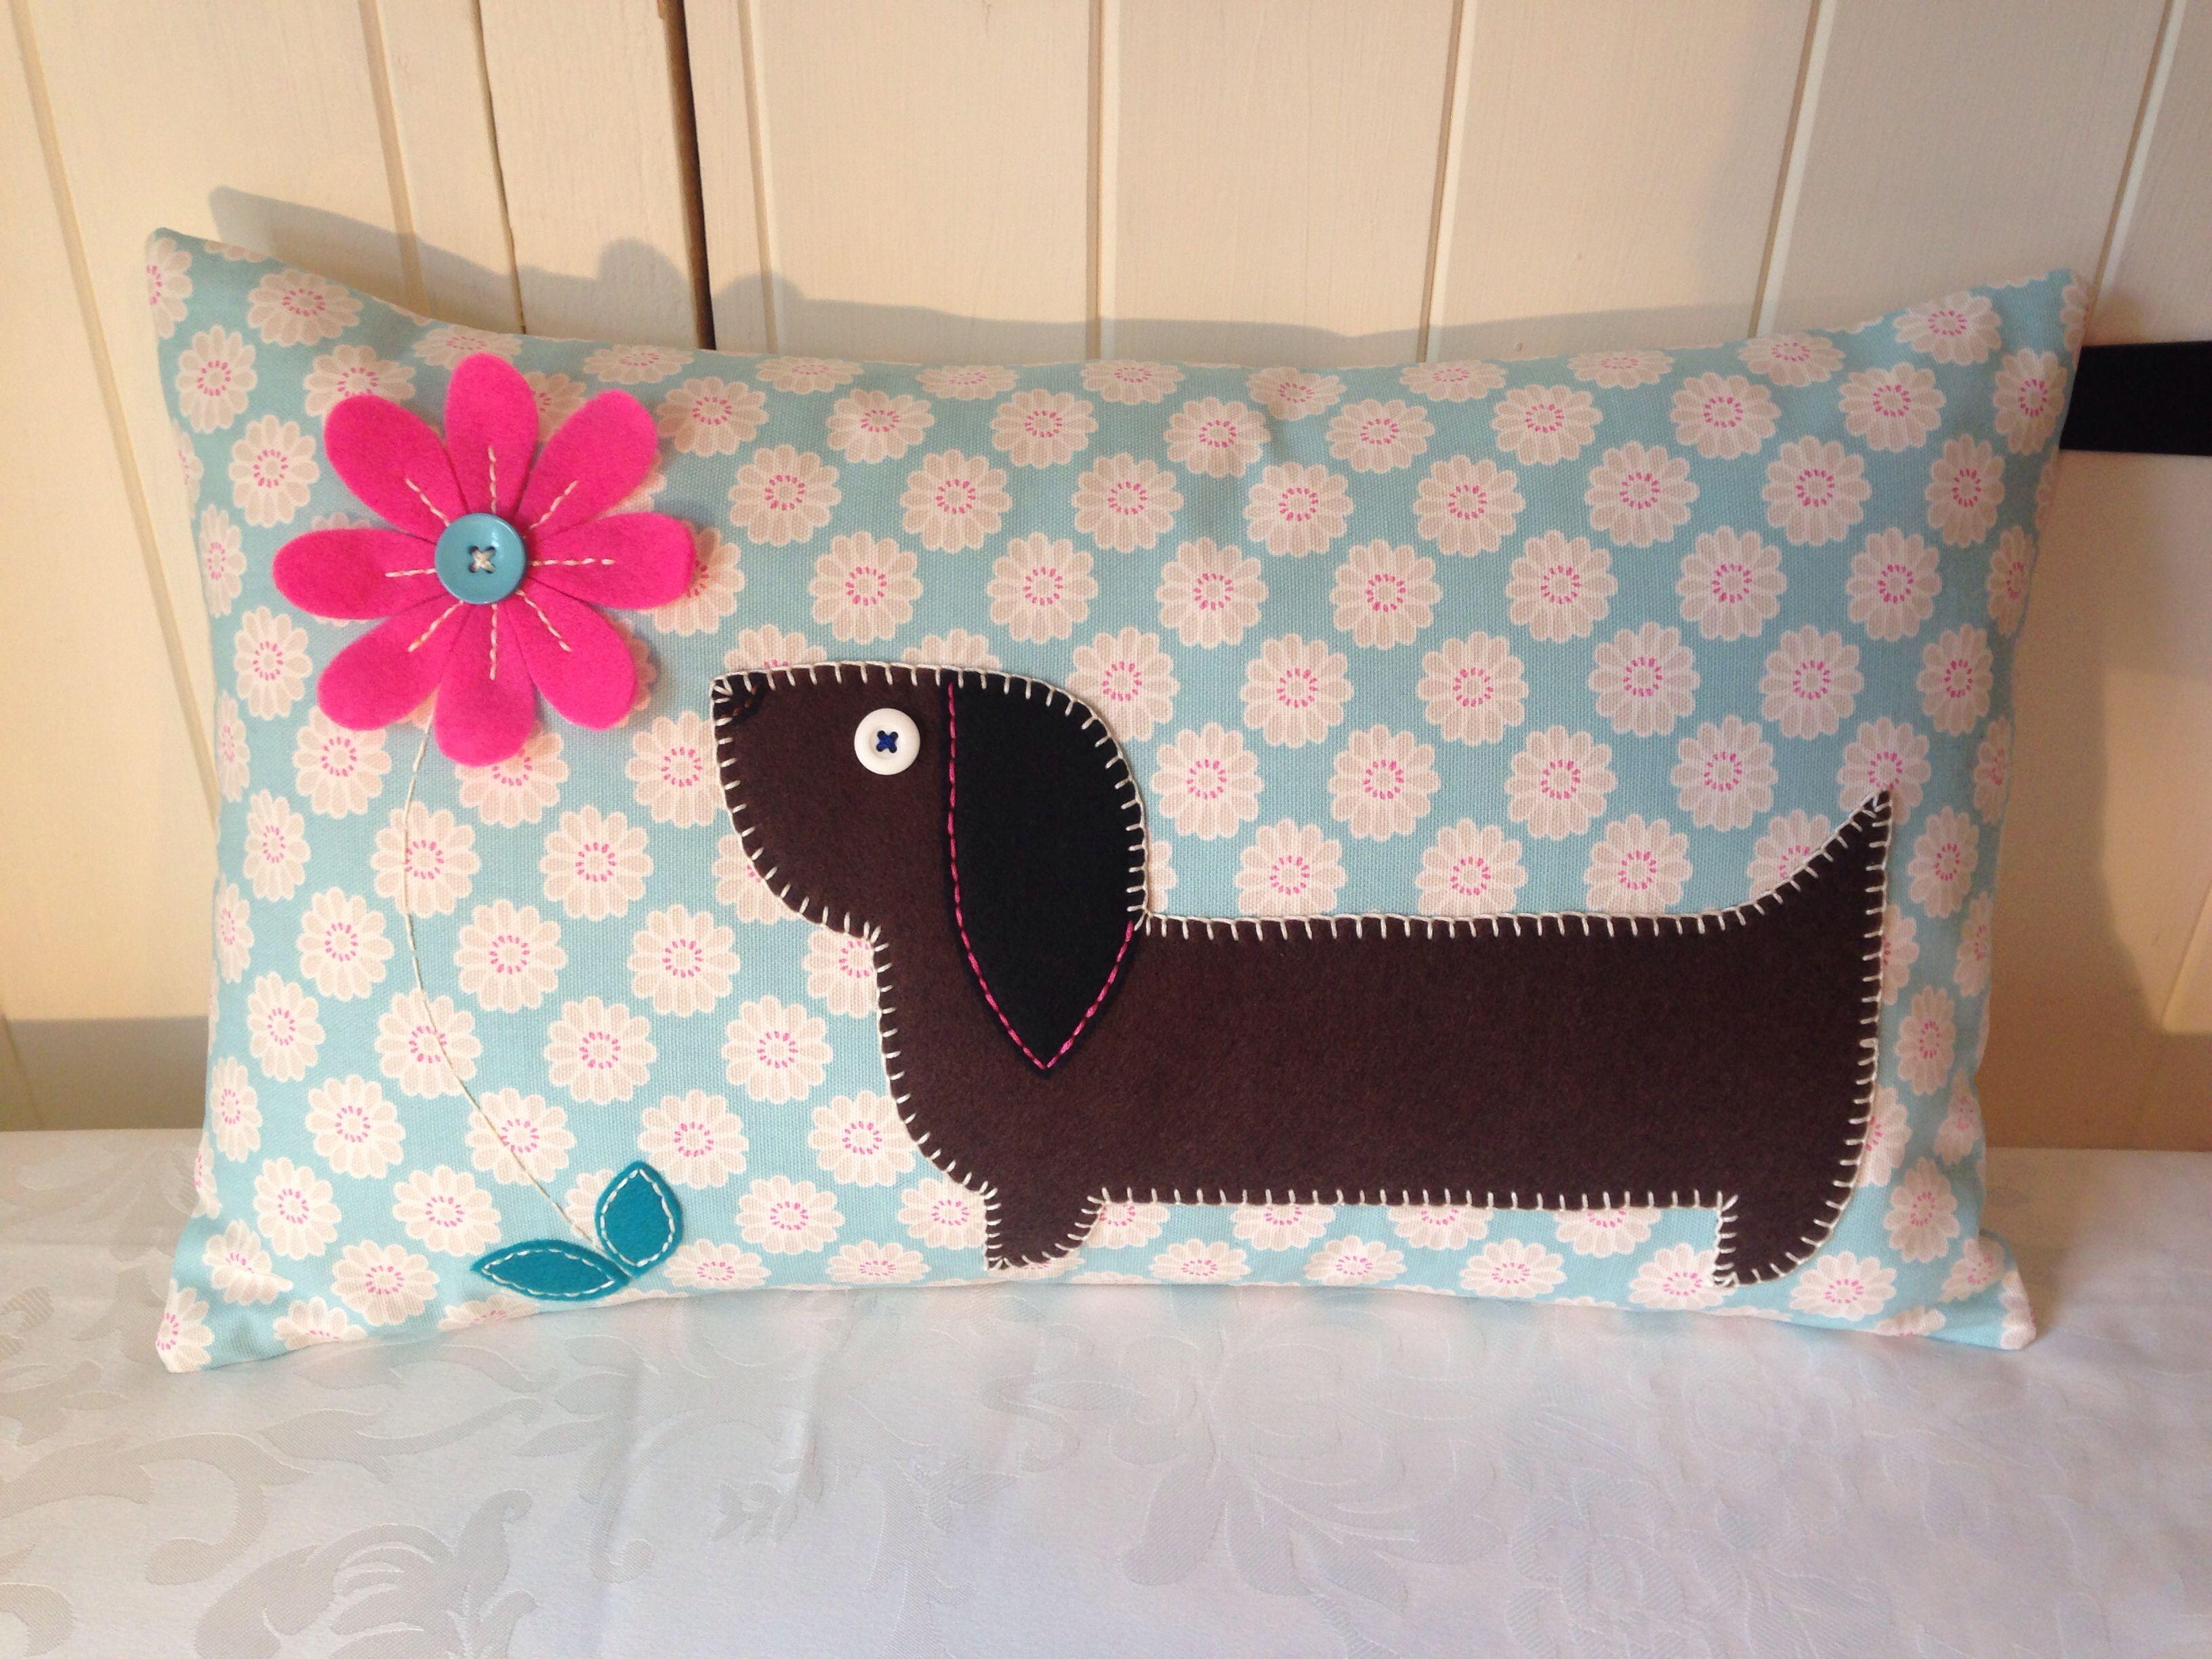 Sausage dog ) (With images) Dog cushions, Sausage dog